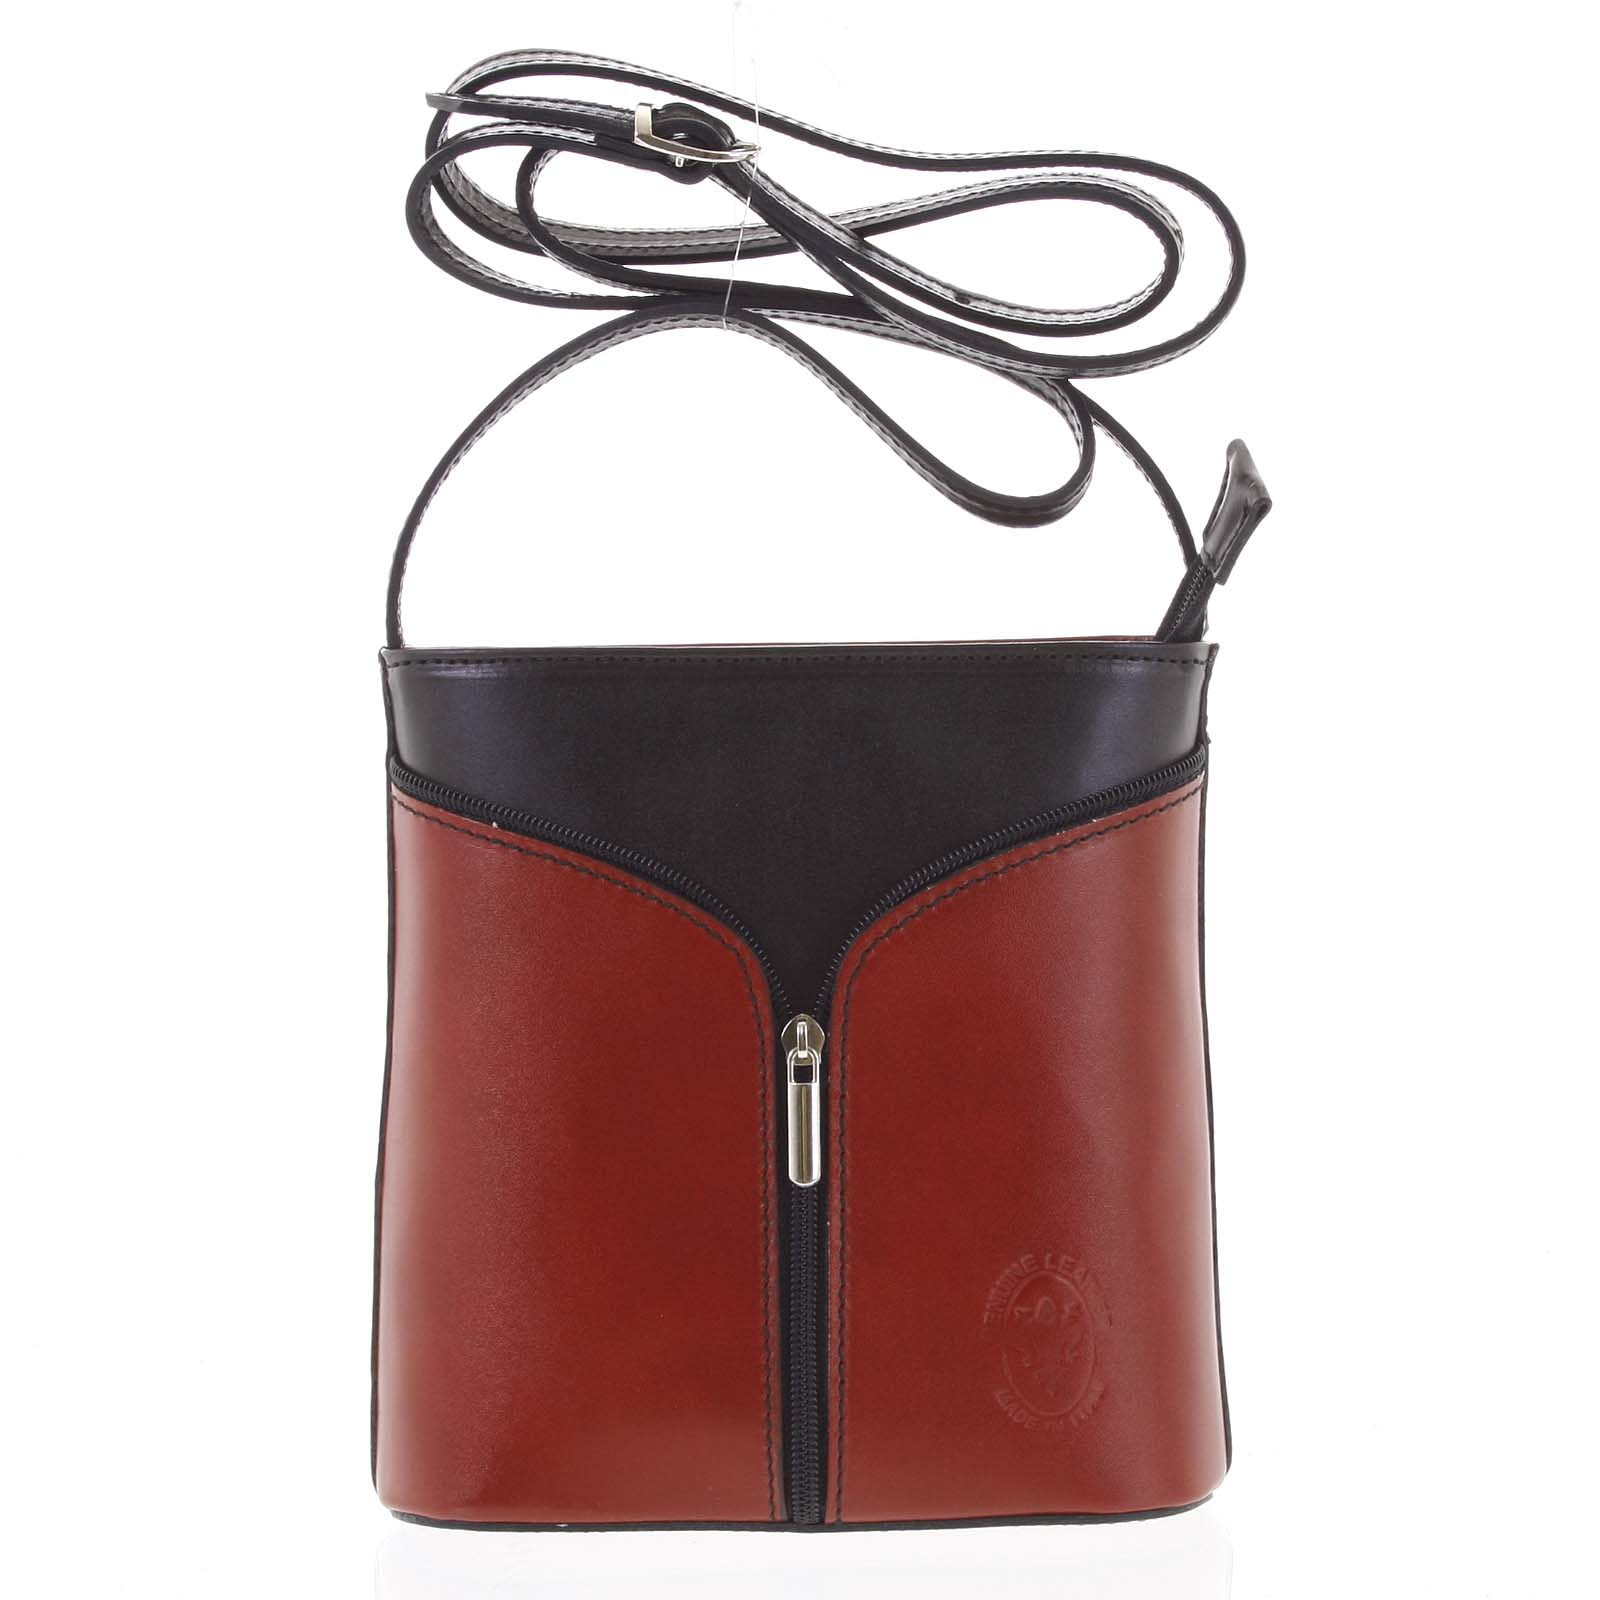 Dámská kožená crossbody kabelka červeno černá - ItalY Hallie červená